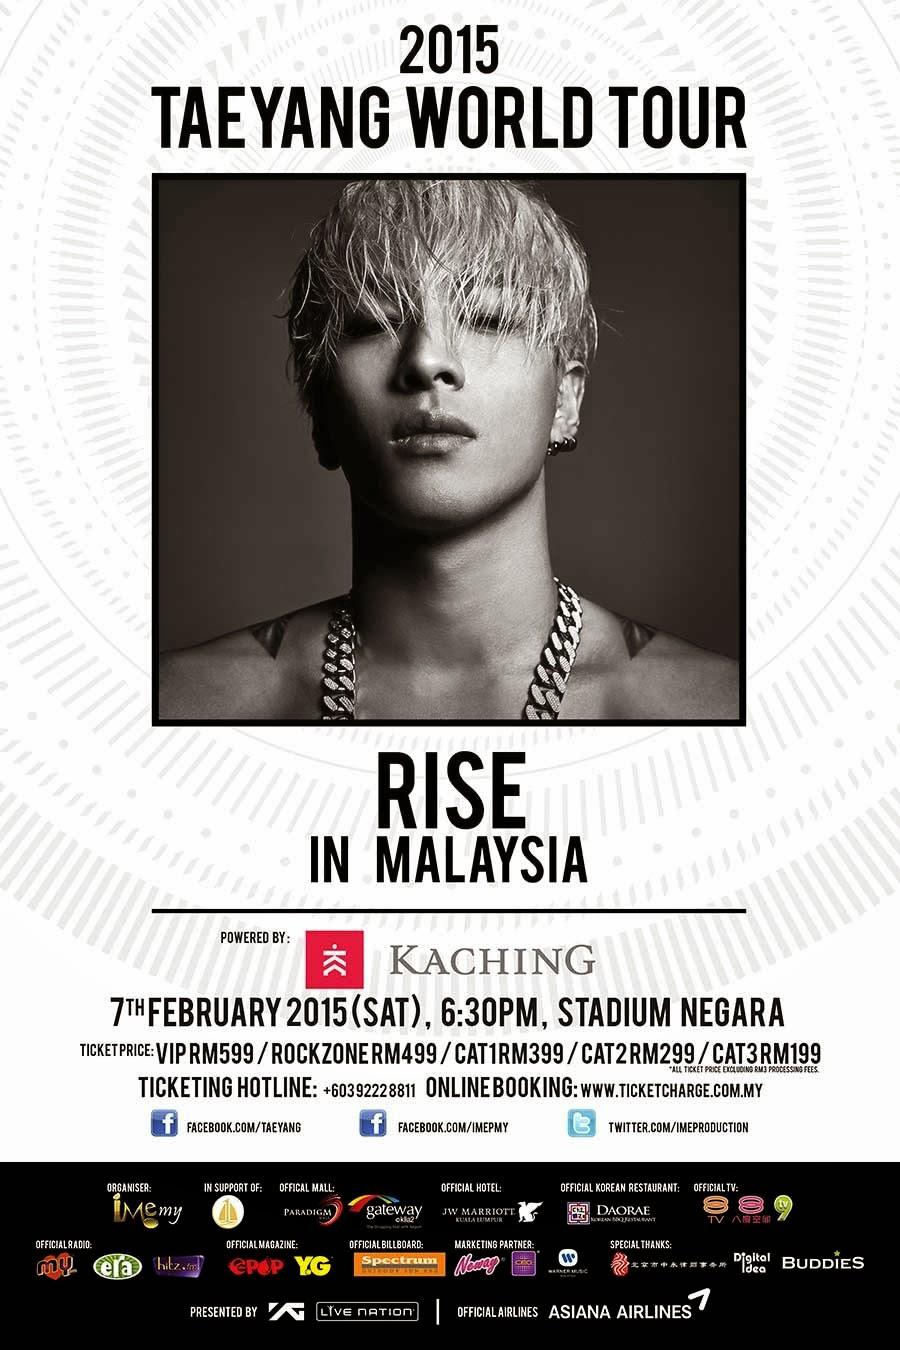 Taeyang World Tour 2020 Pelancongan Kini   Malaysia (Malaysia   Tourism Now): 2015 Taeyang